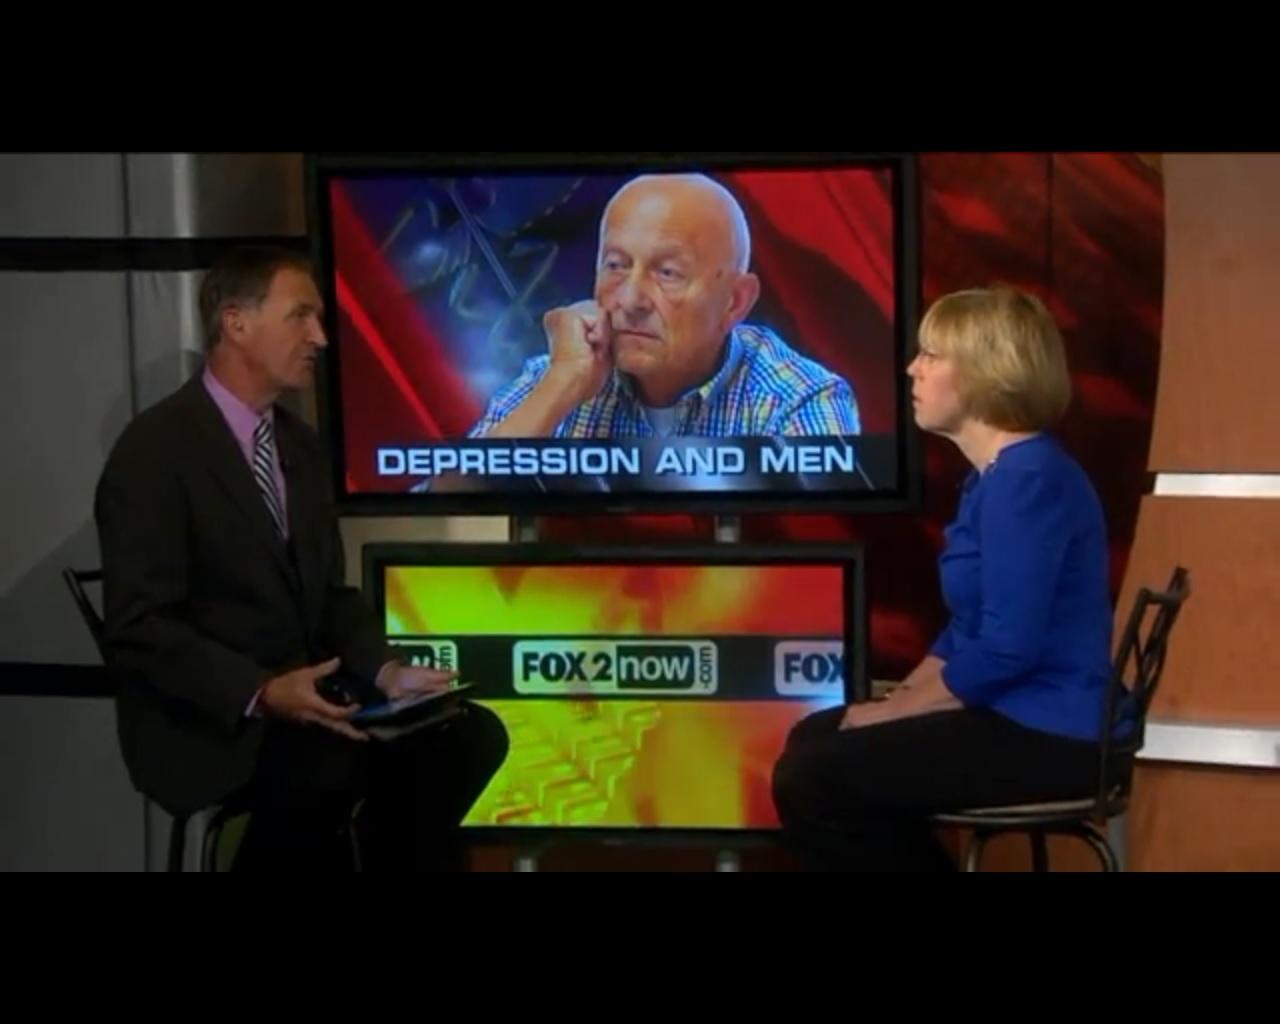 MIMH's Liz Sale Interviewed by Fox 2 News